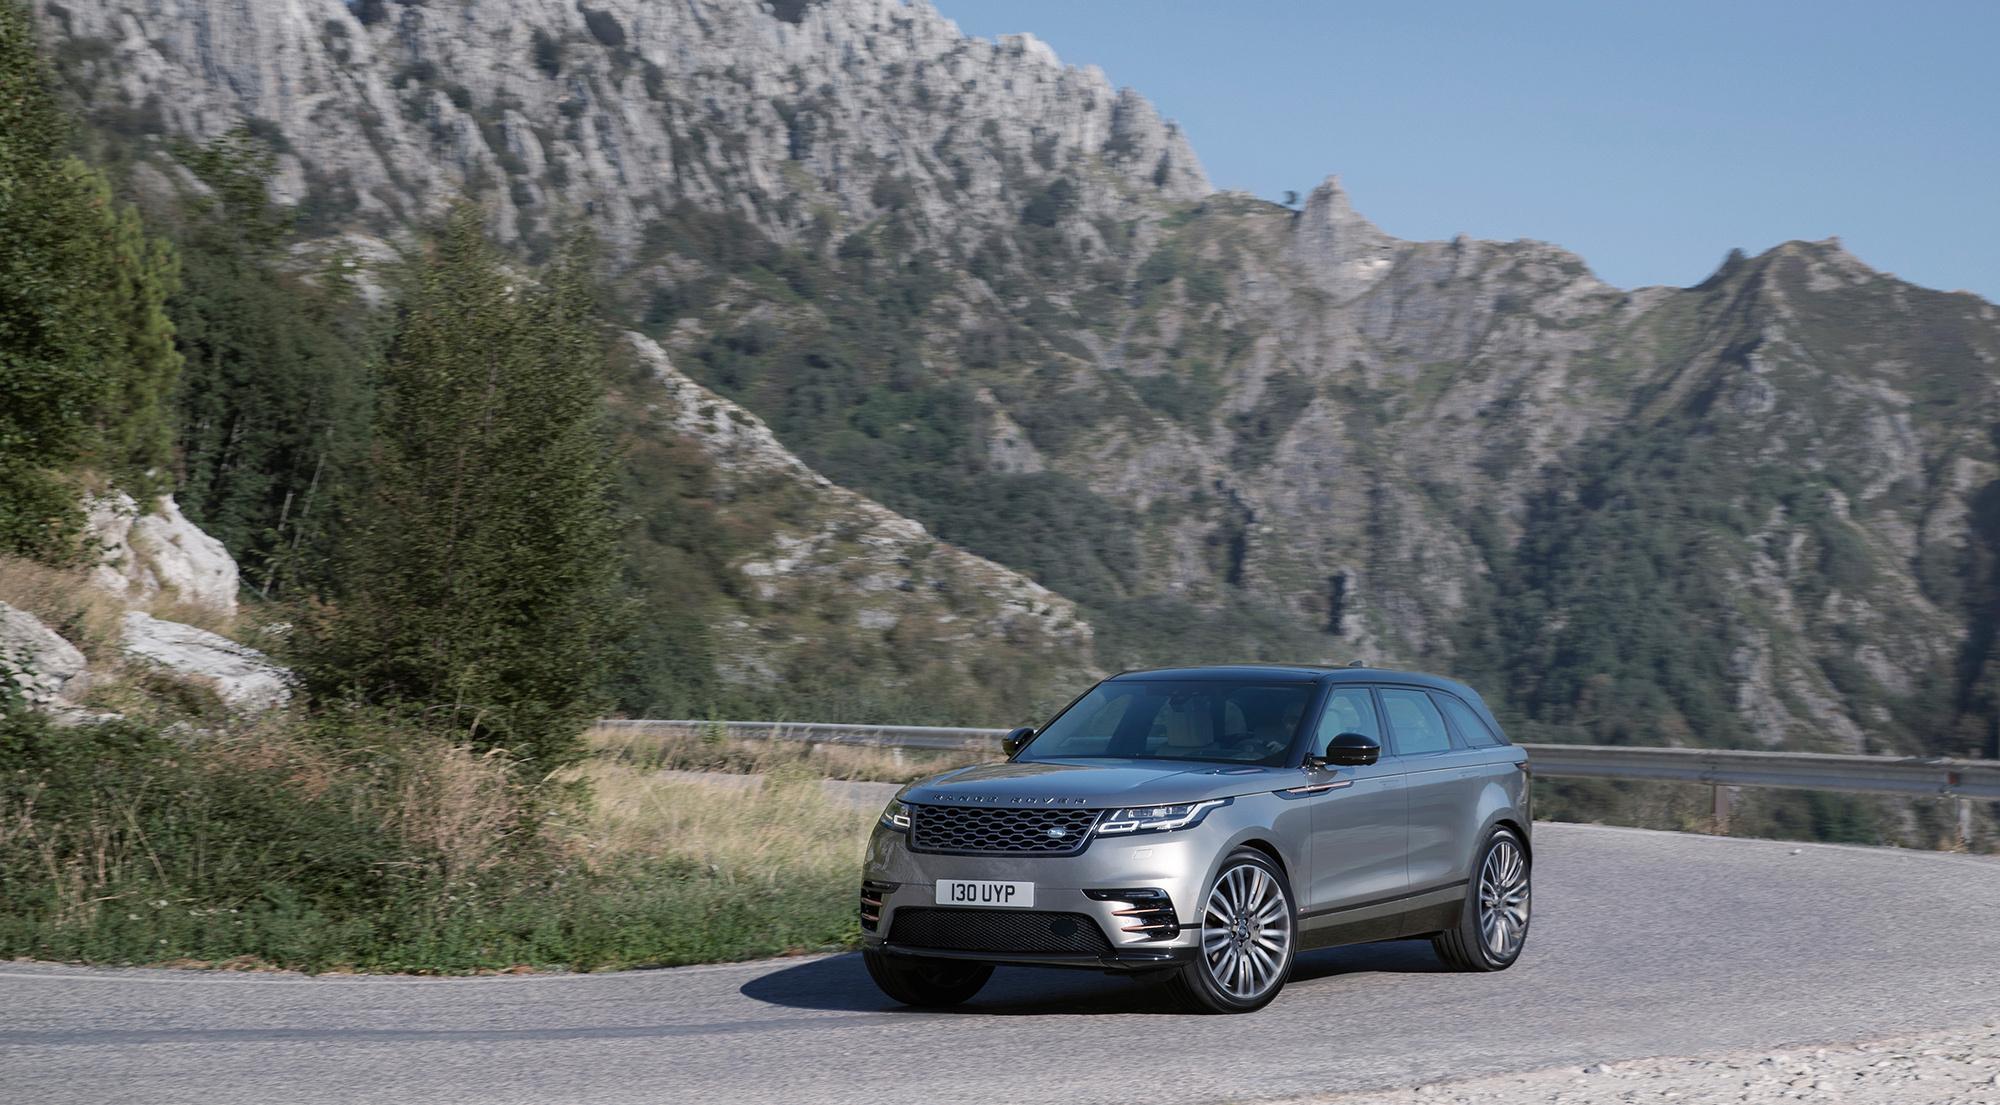 Range Rover Velar Free Download